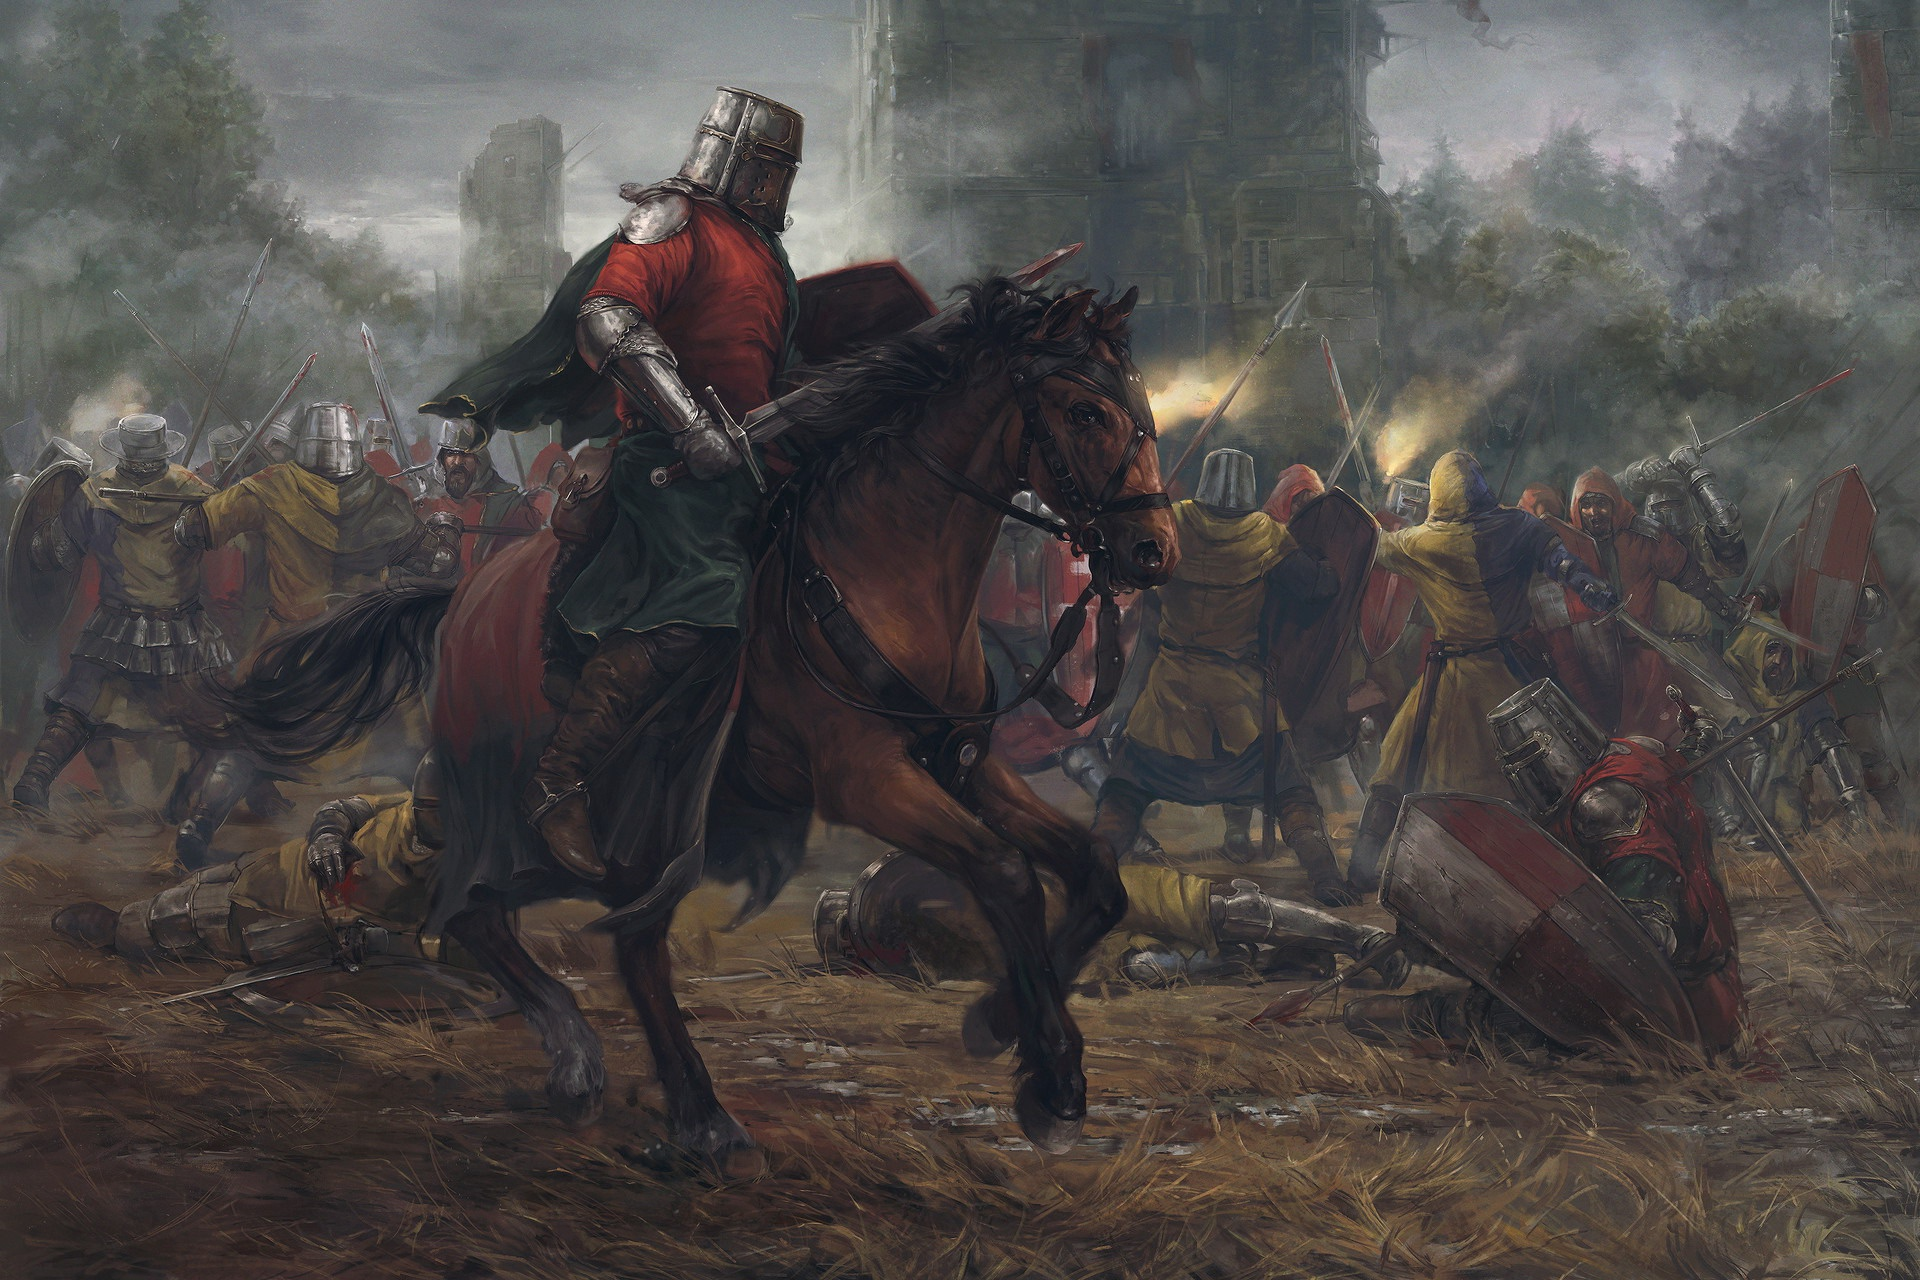 Битва рыцарей картинка